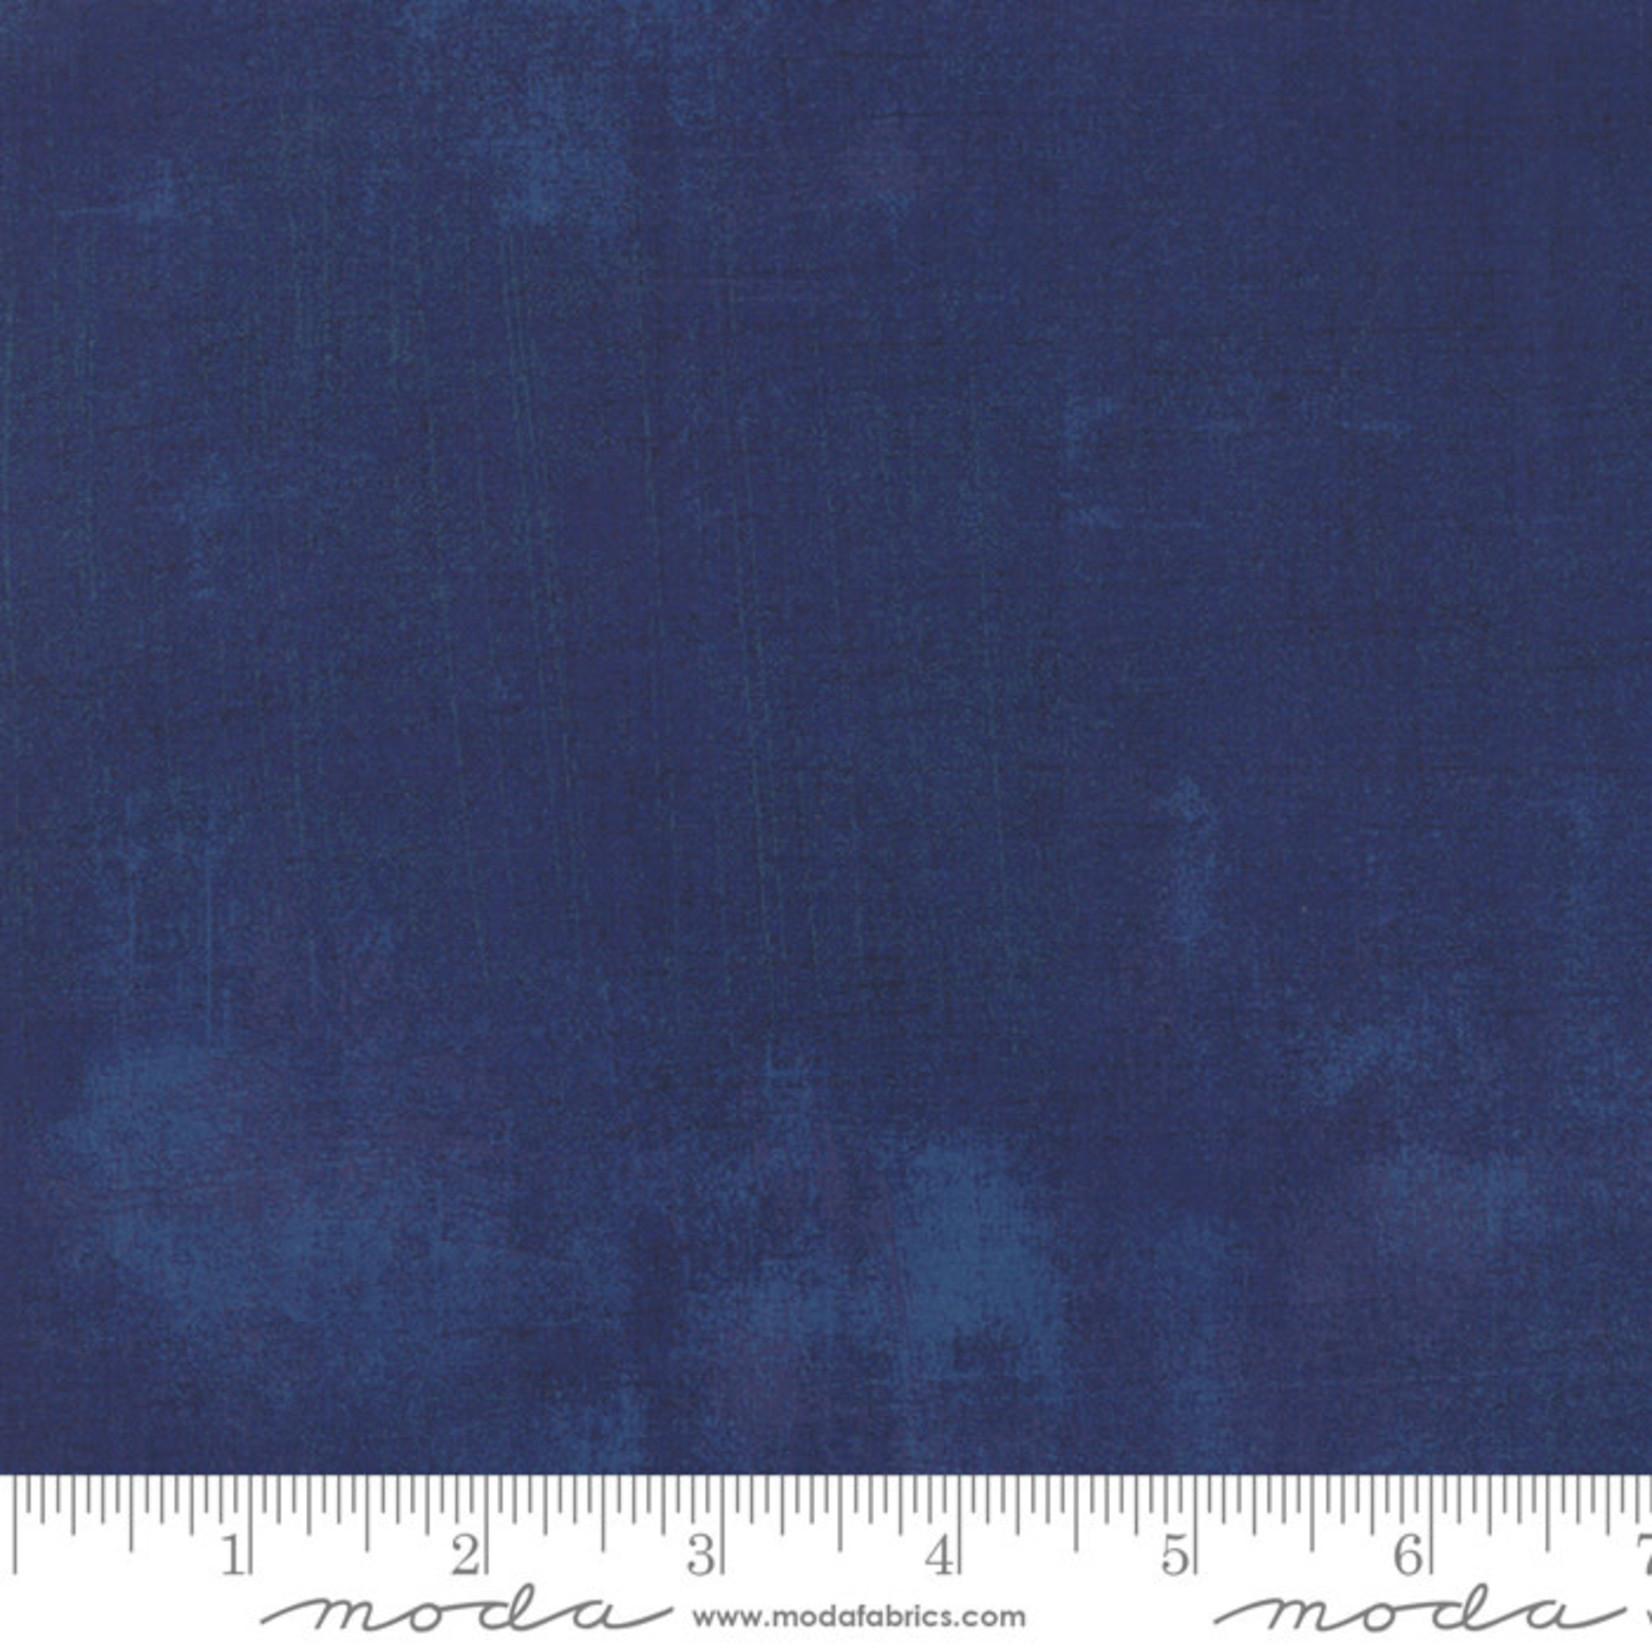 Moda Grunge Basics Grunge - Navy per cm or $20/m